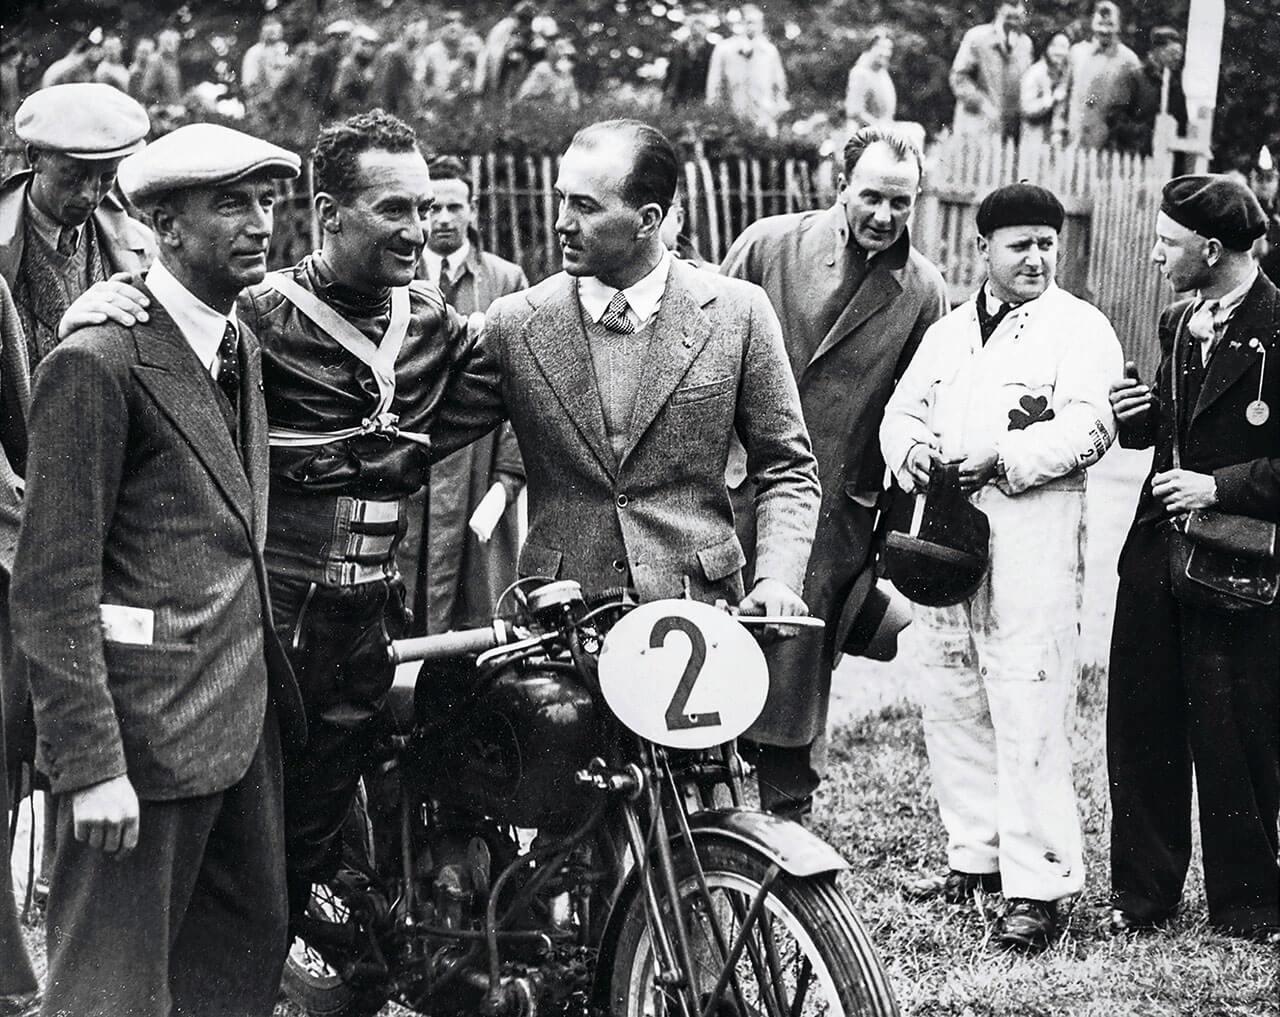 Carlo Guzzi, Stanley Woods, Giorgio Parodi és a Moto Guzzi 1935-ben